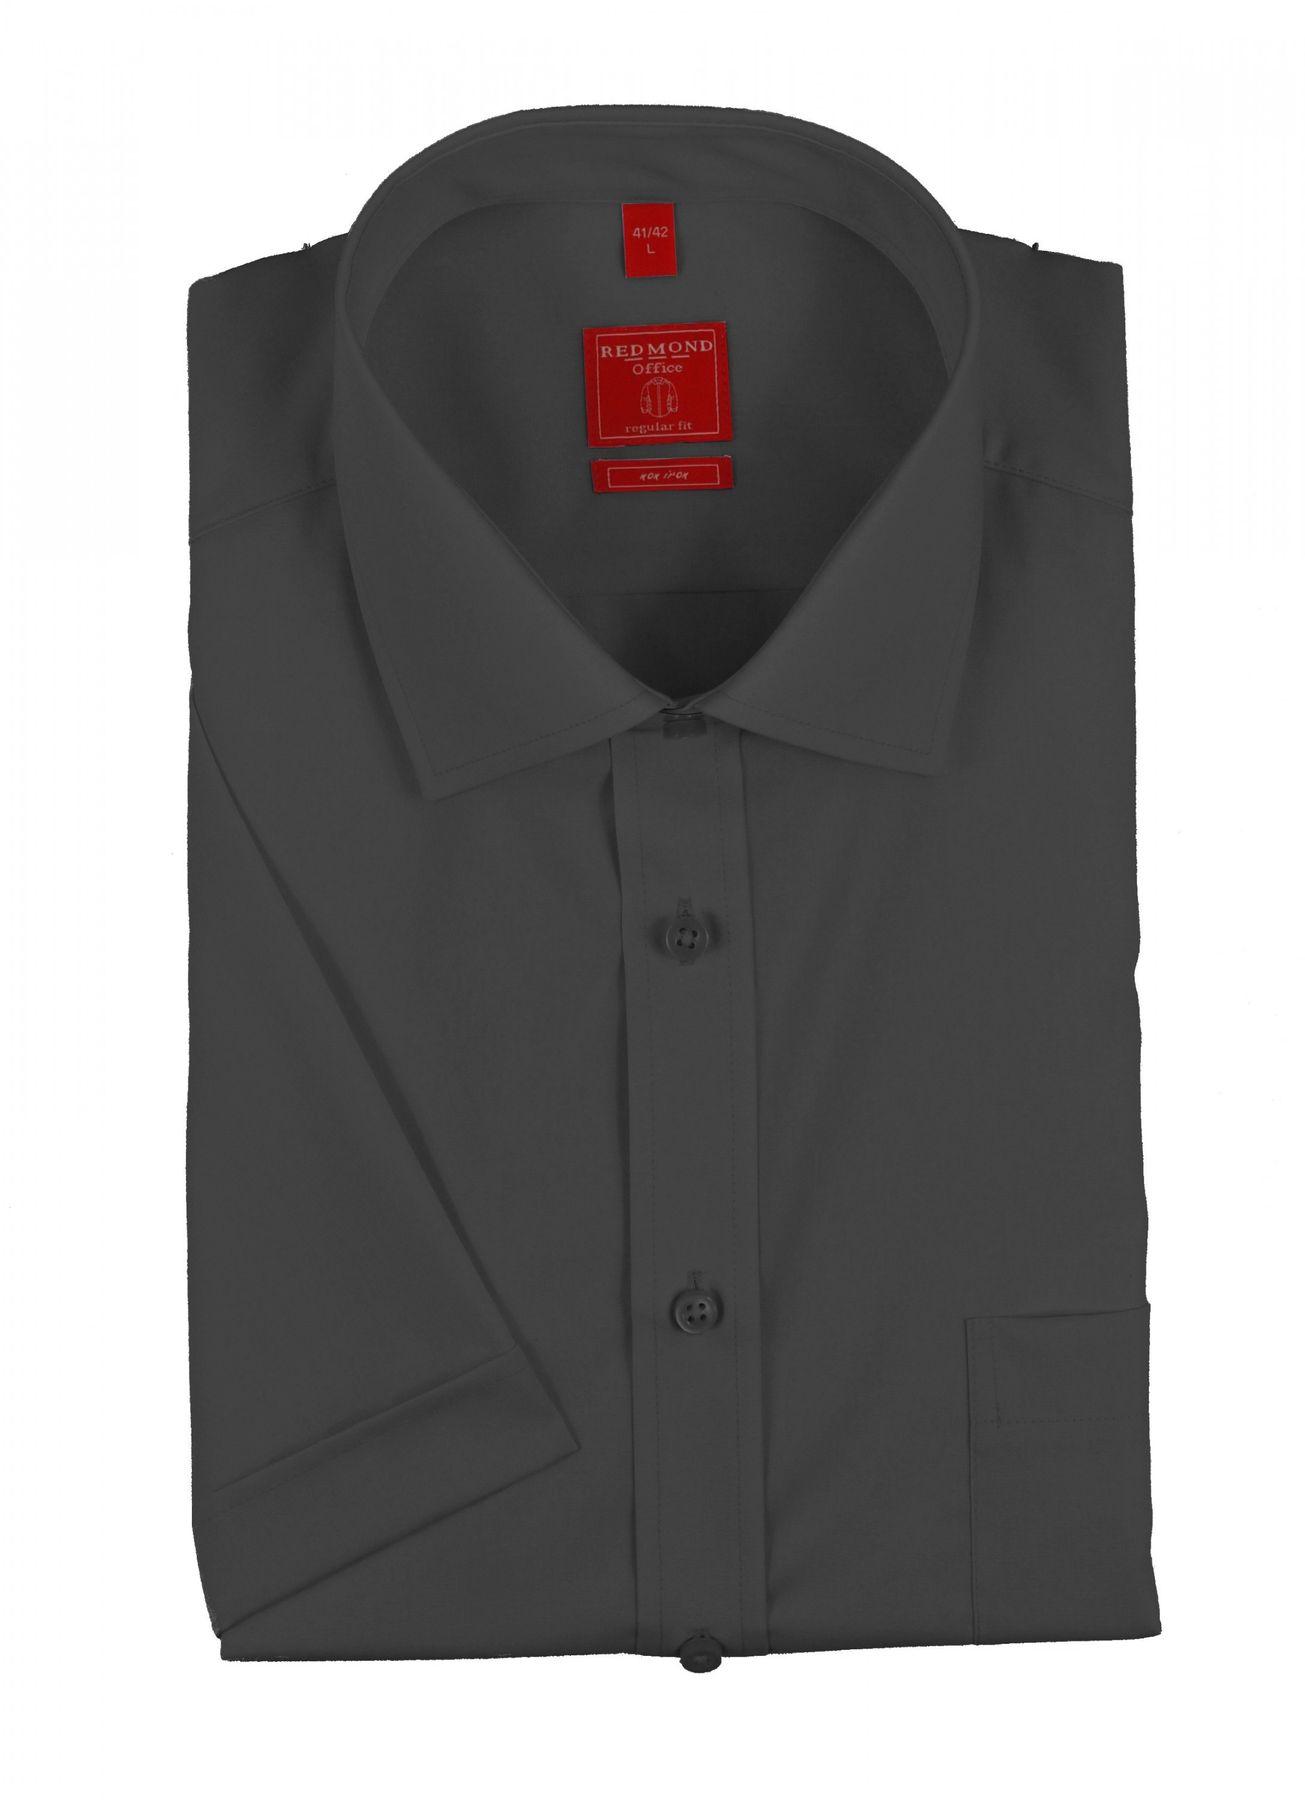 Redmond - Regular Fit - Herren Kurzarm Hemd mit Kent-Kragen in verschiedenen Farben (150920 A) – Bild 2